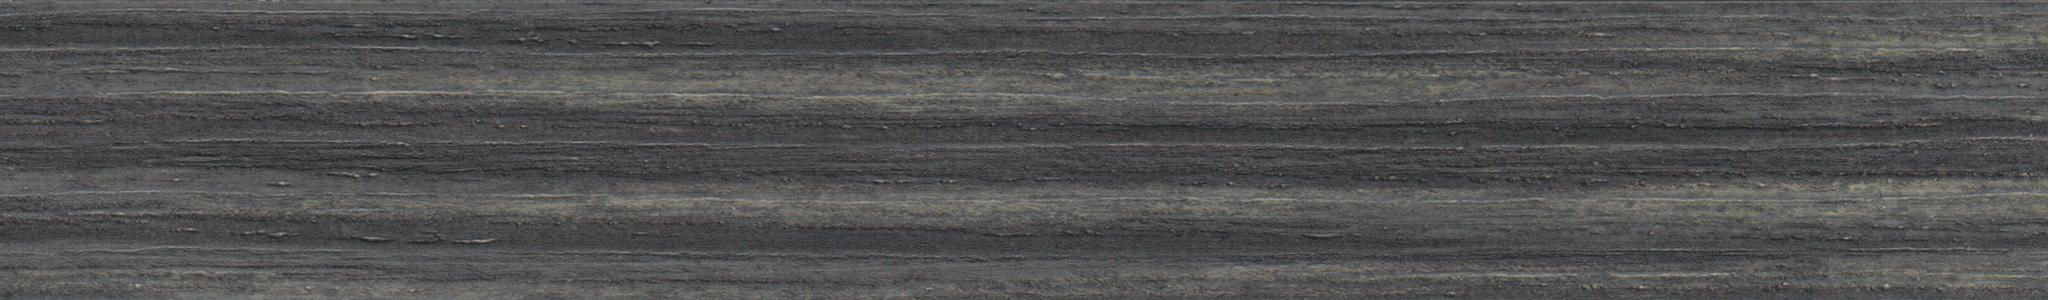 HD 293082 ABS Edge Amazonas Pore